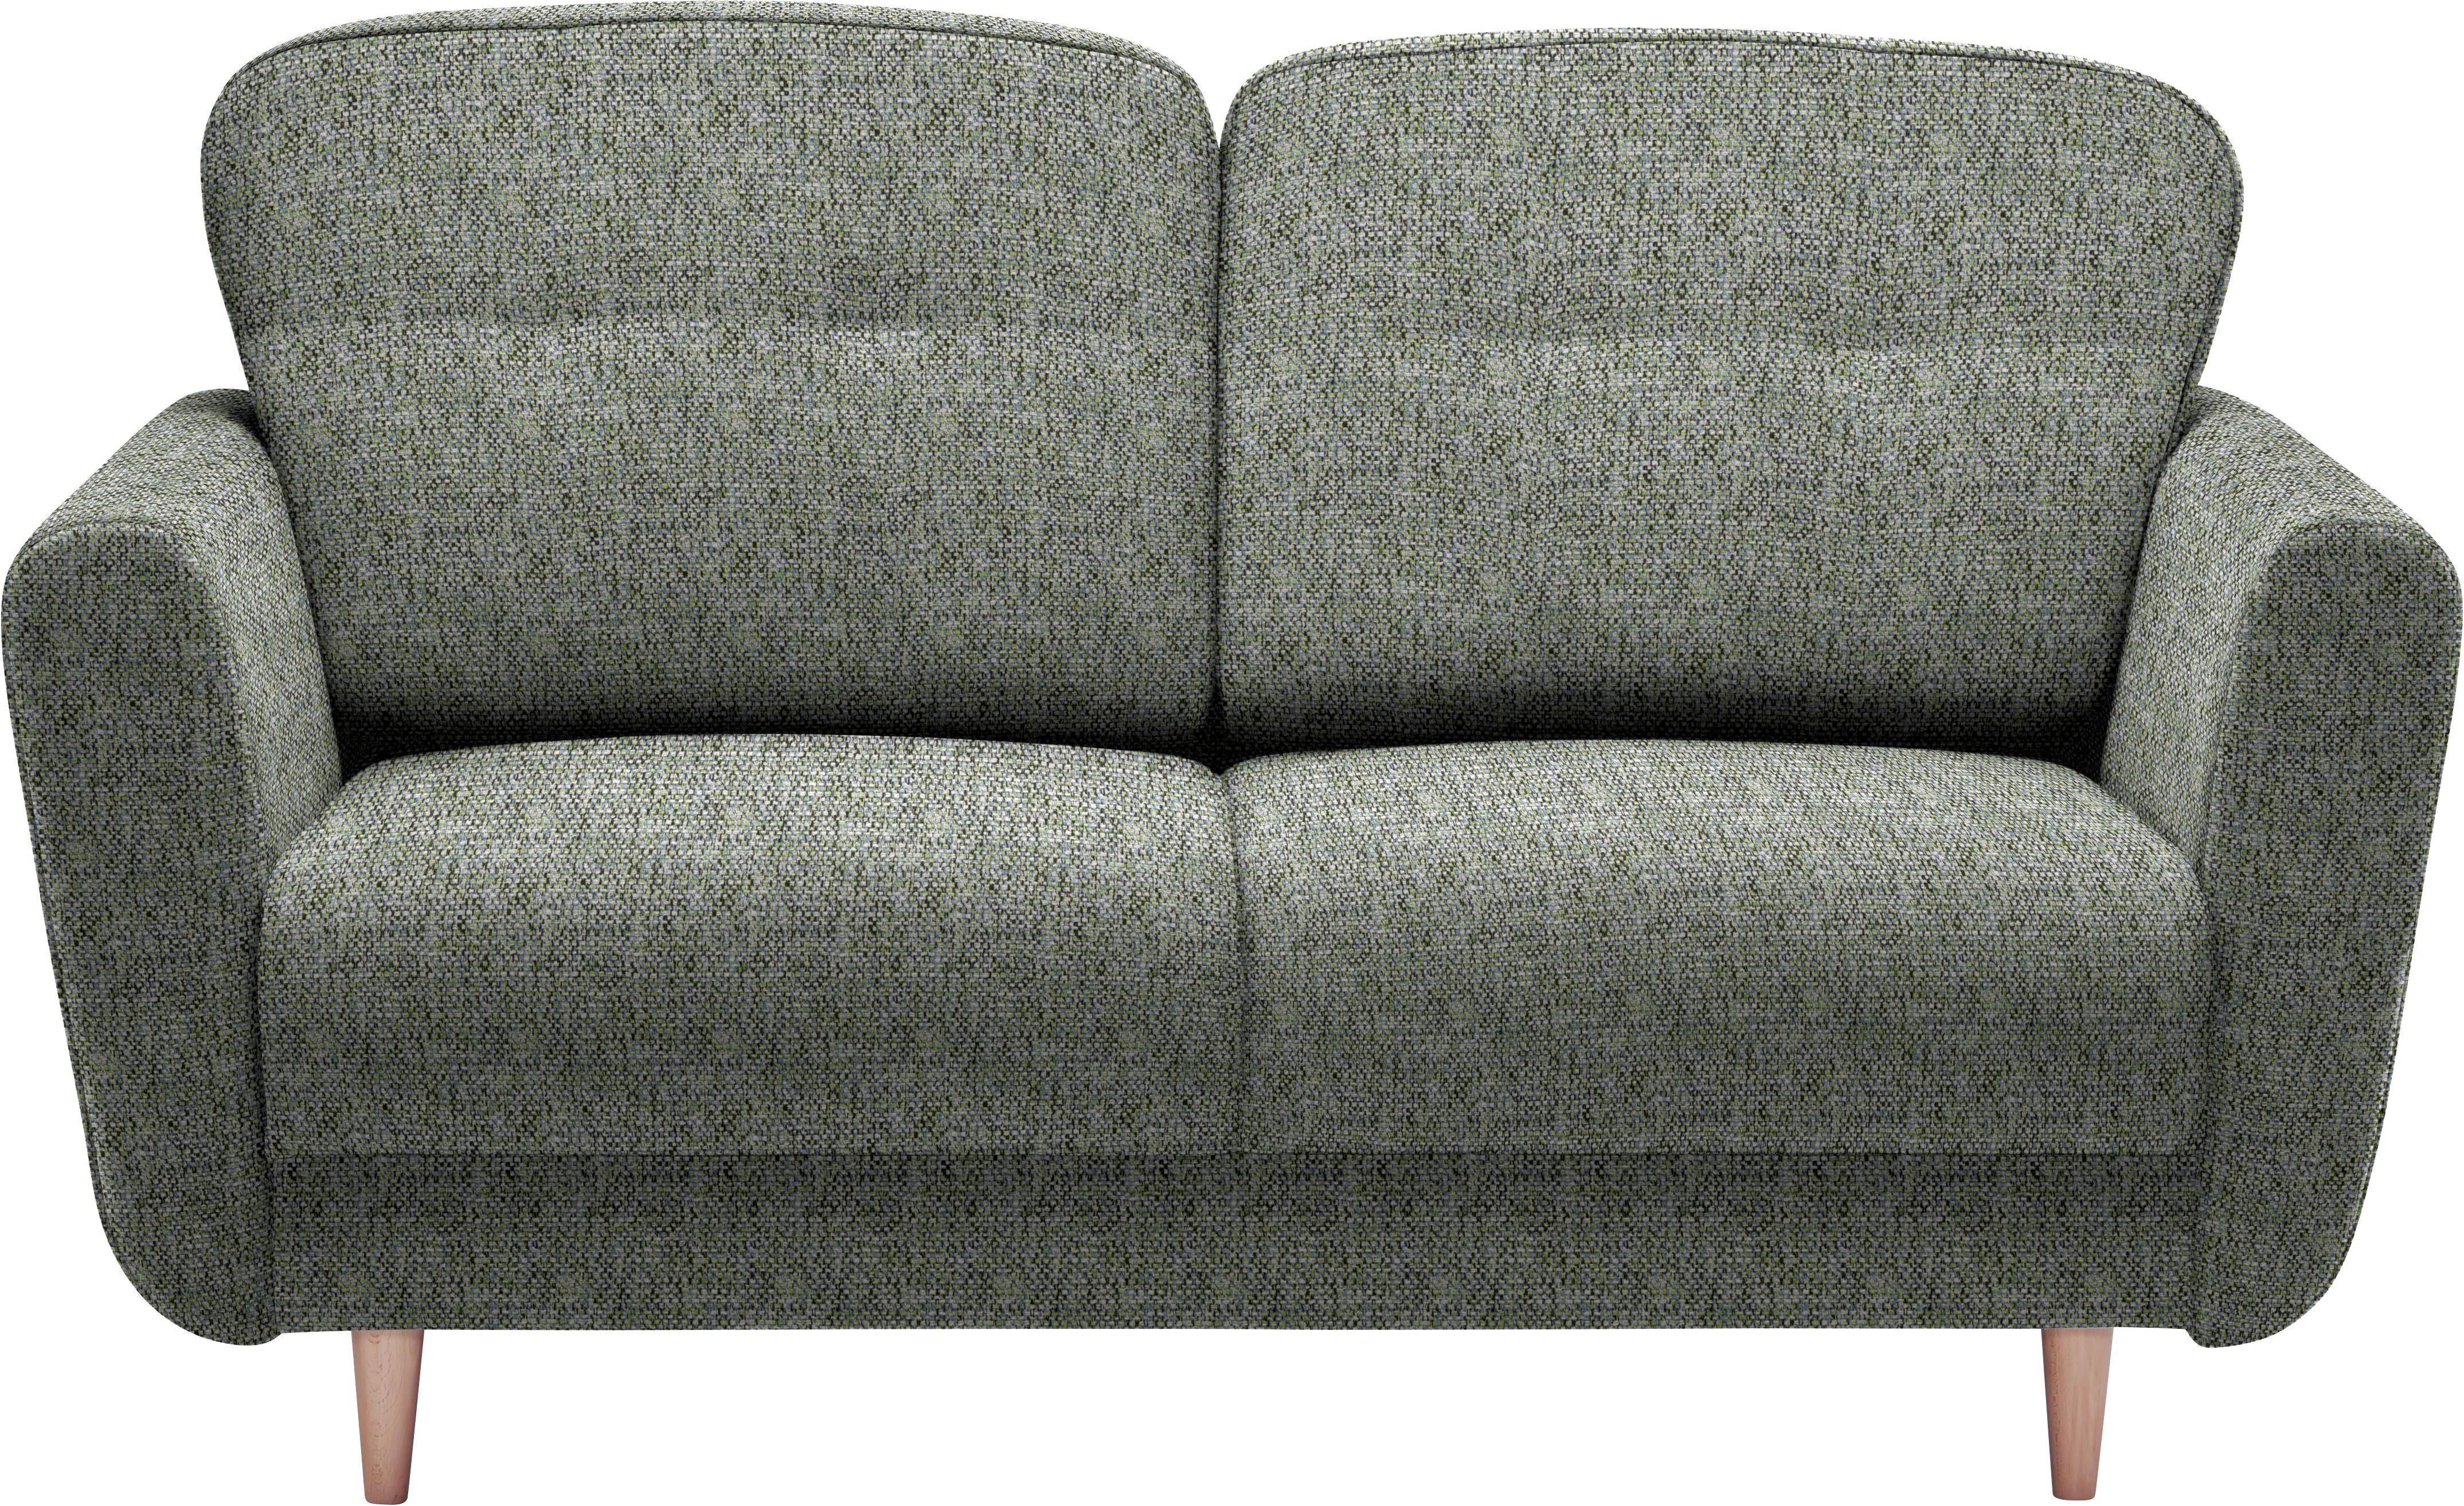 ZWEISITZER-SOFA Blau, Grün - Blau/Grün, Design, Holz/Textil (154/90/93cm) - HOM`IN